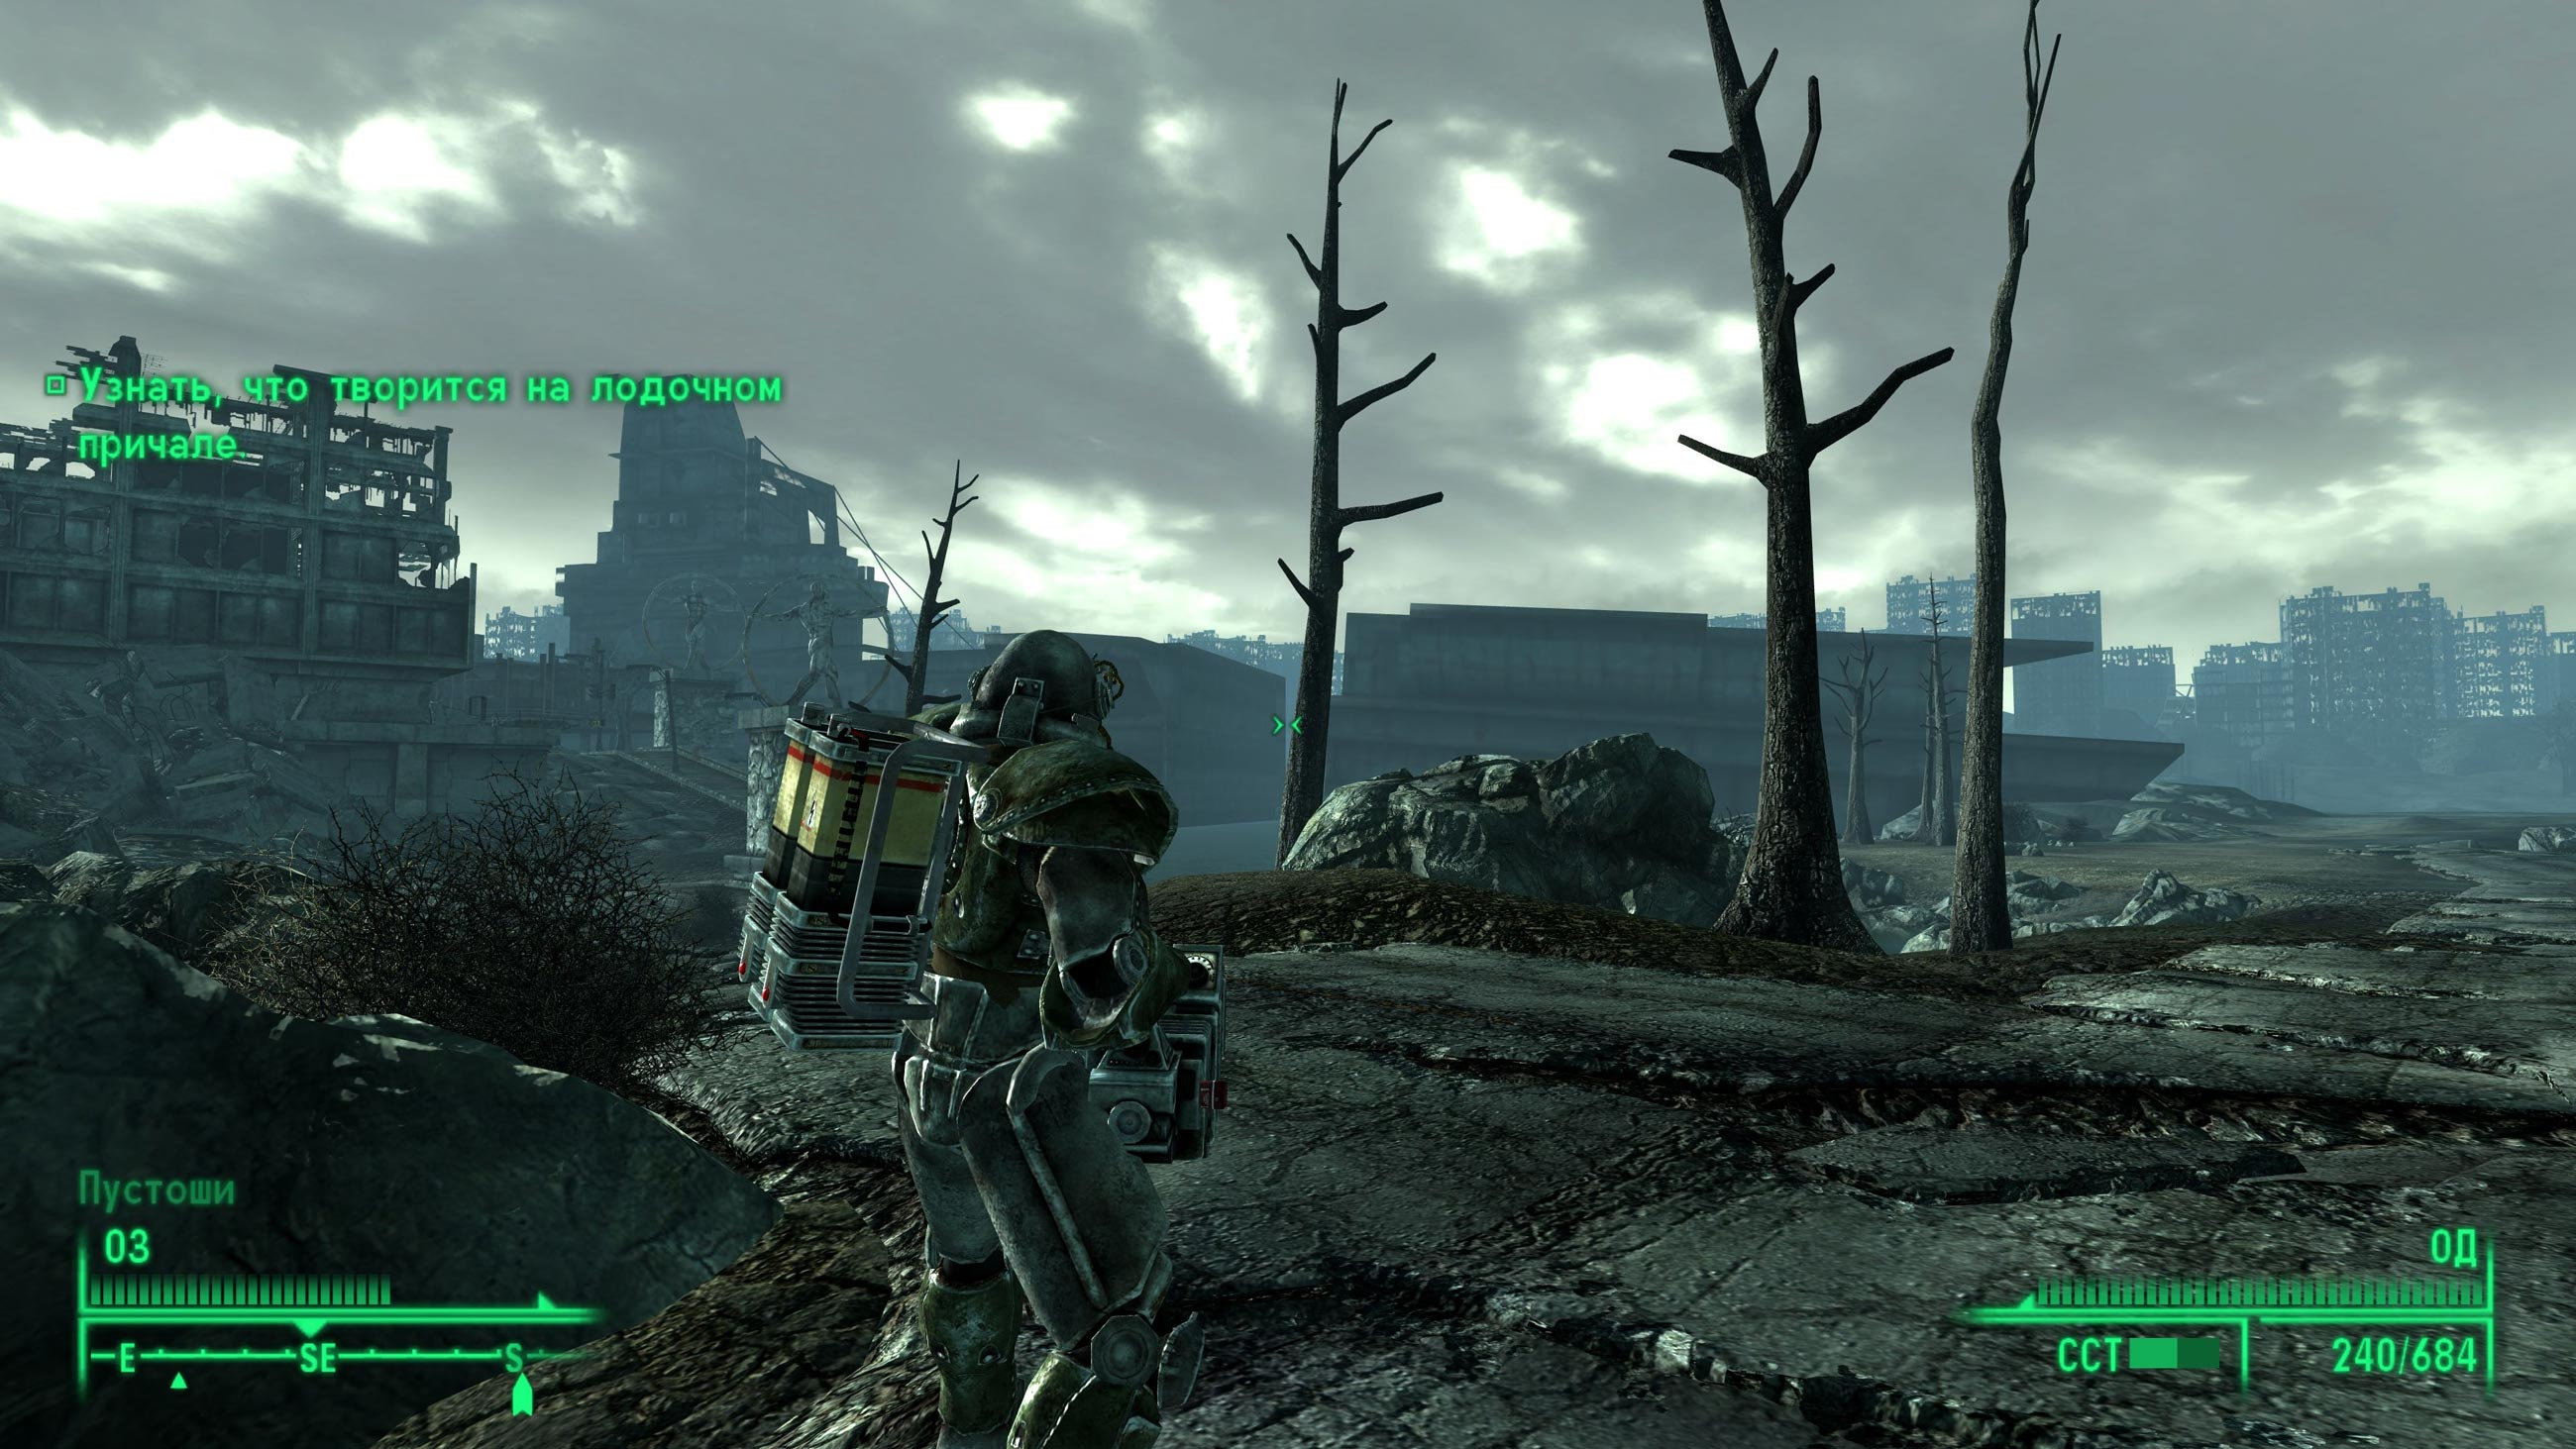 Fallout 3 Sexus on windows 10 fix Crash new game